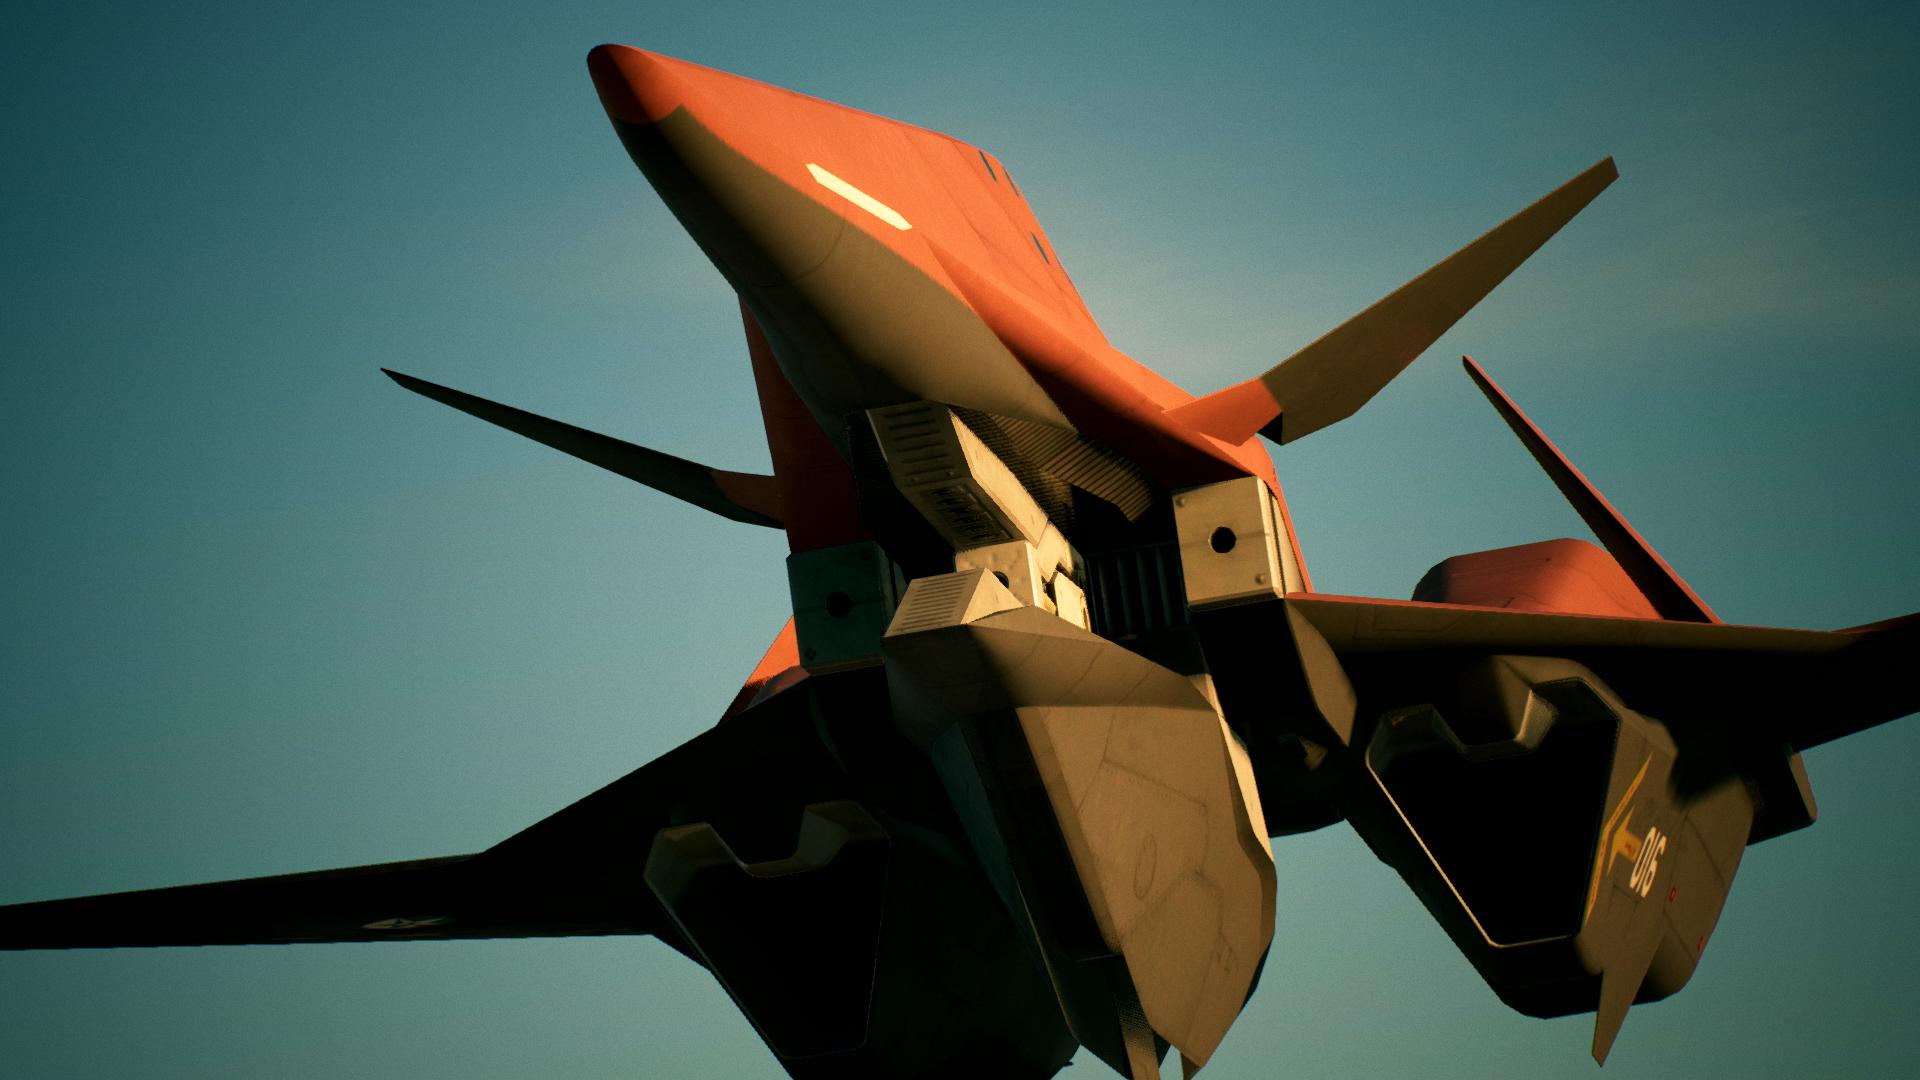 ACE COMBAT™ 7: SKIES UNKNOWN :: DLC 2: ADF-01 FALKEN Set Out